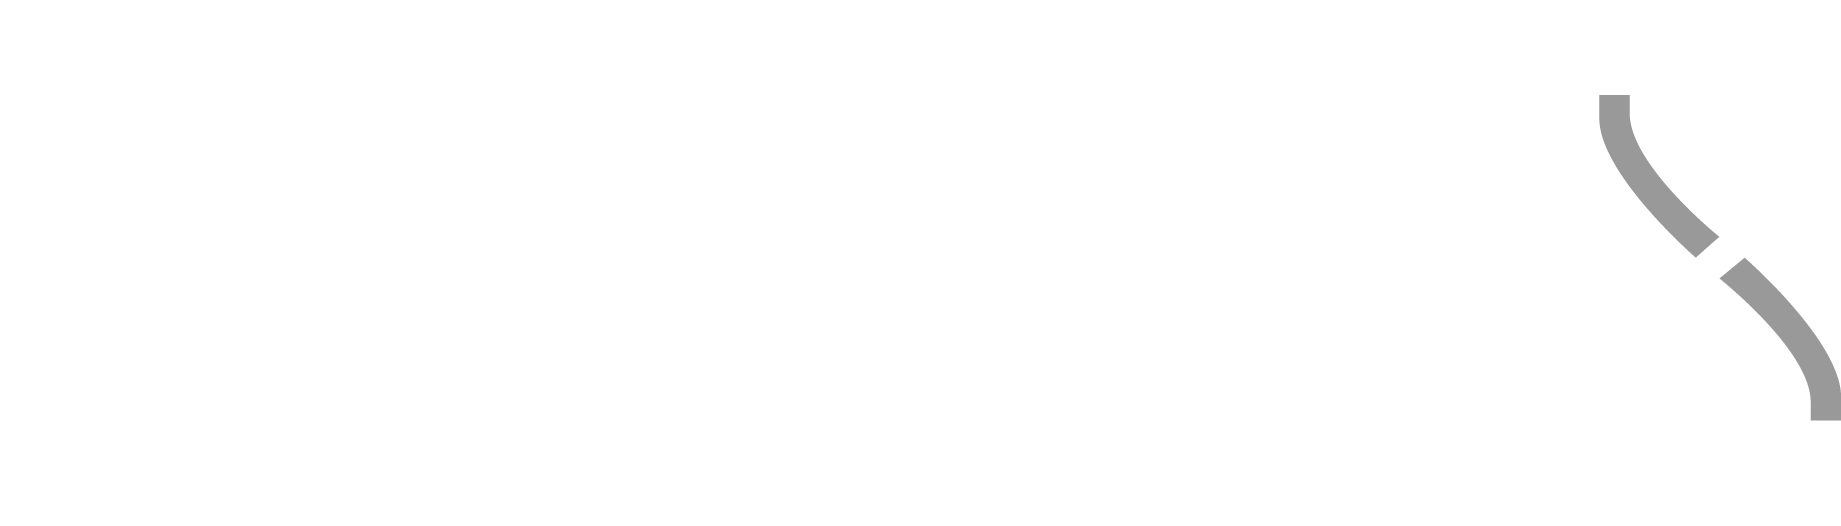 HeliX Network World